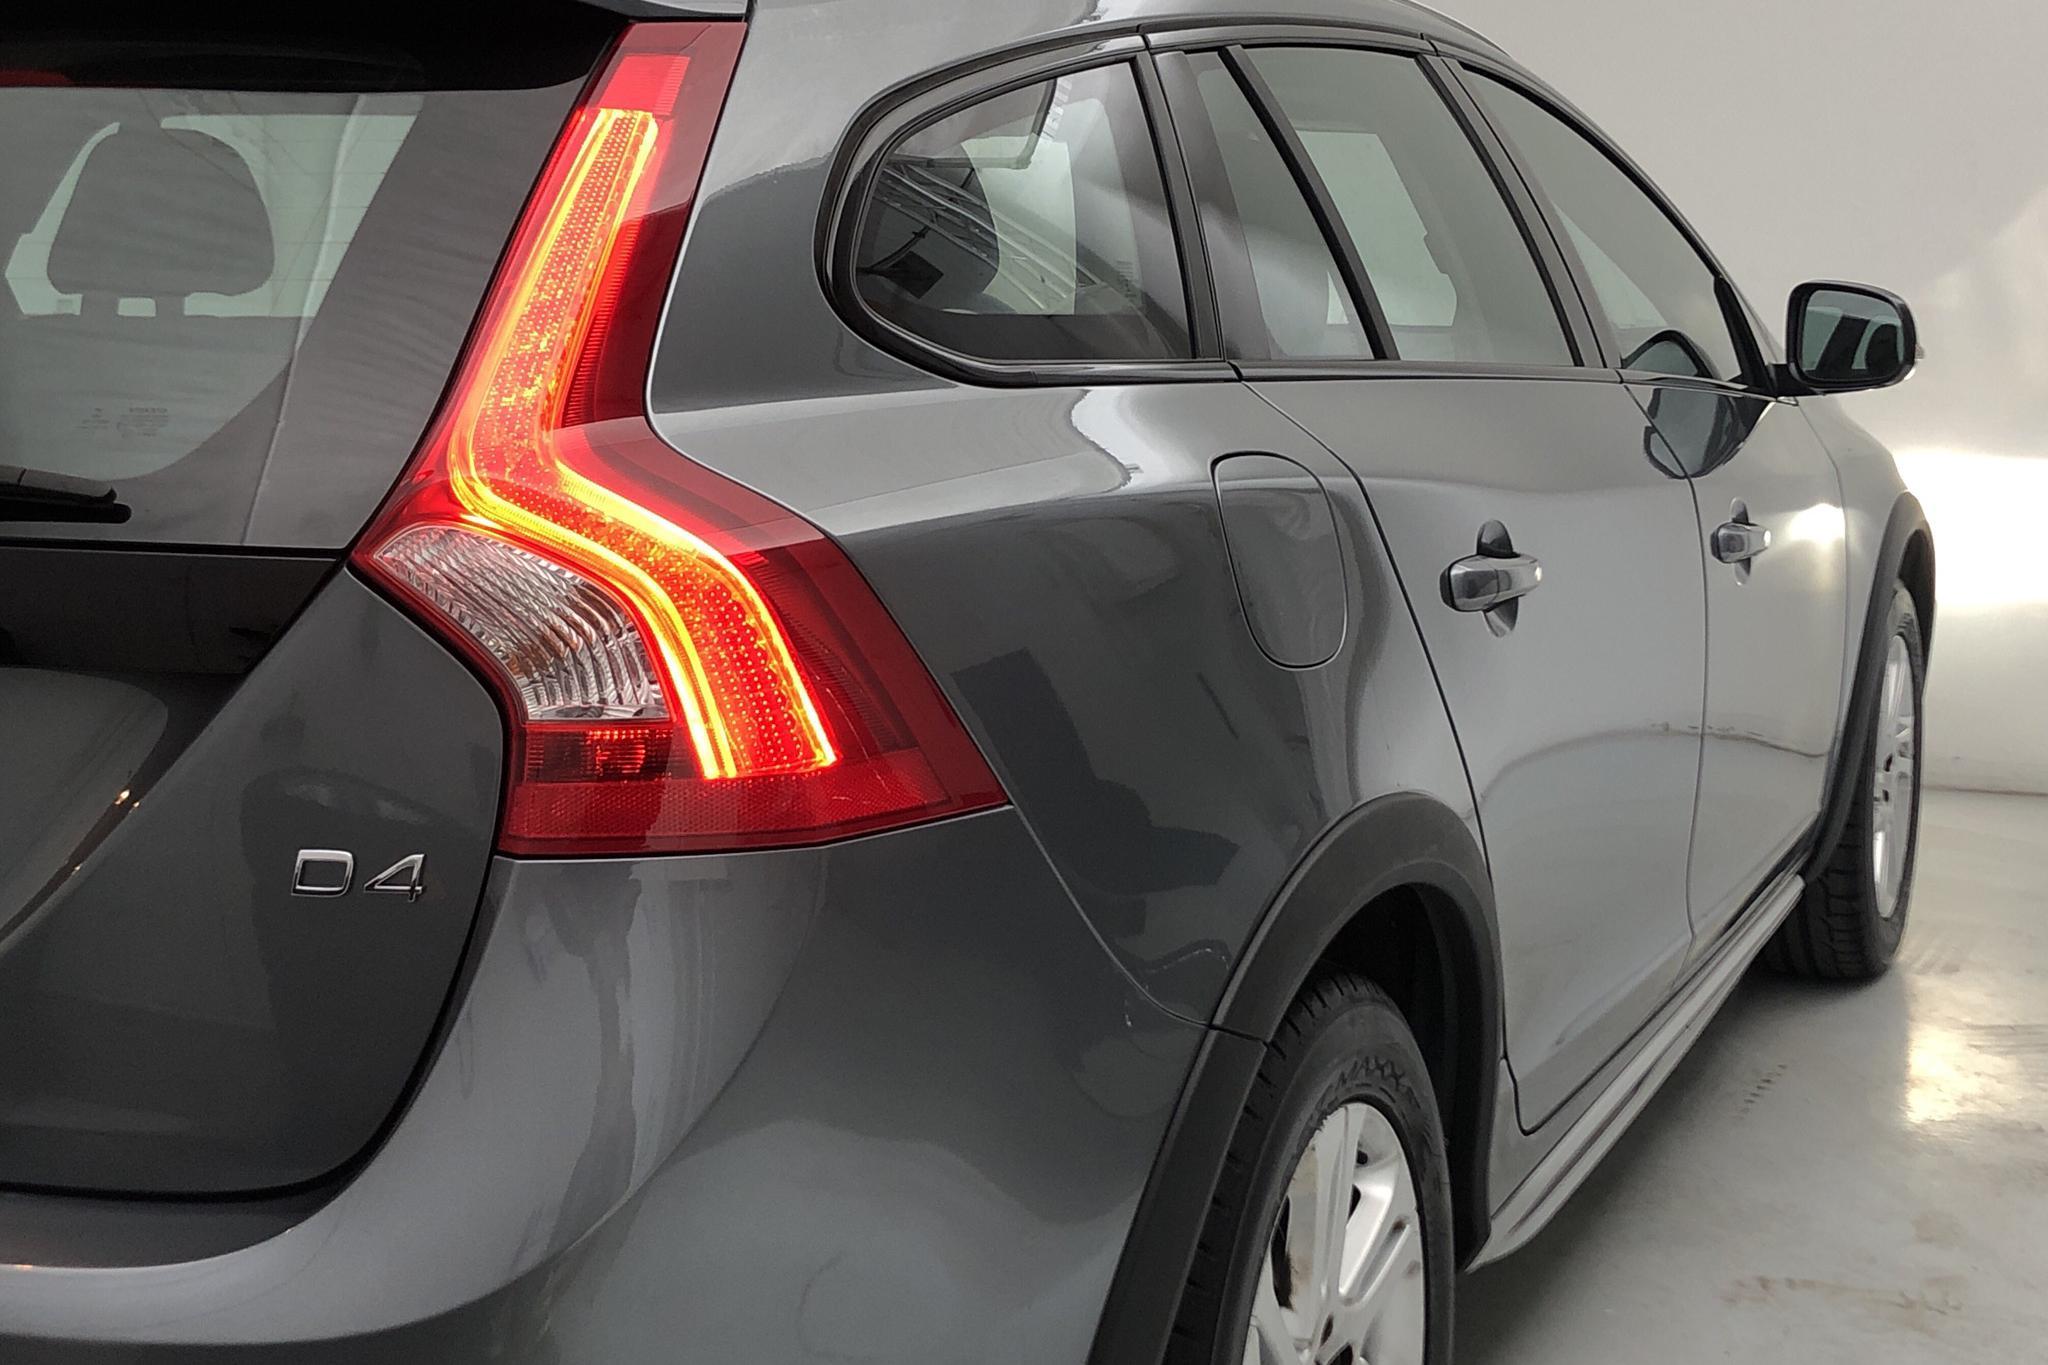 Volvo V60 D4 Cross Country (190hk) - 8 852 mil - Automat - grå - 2017